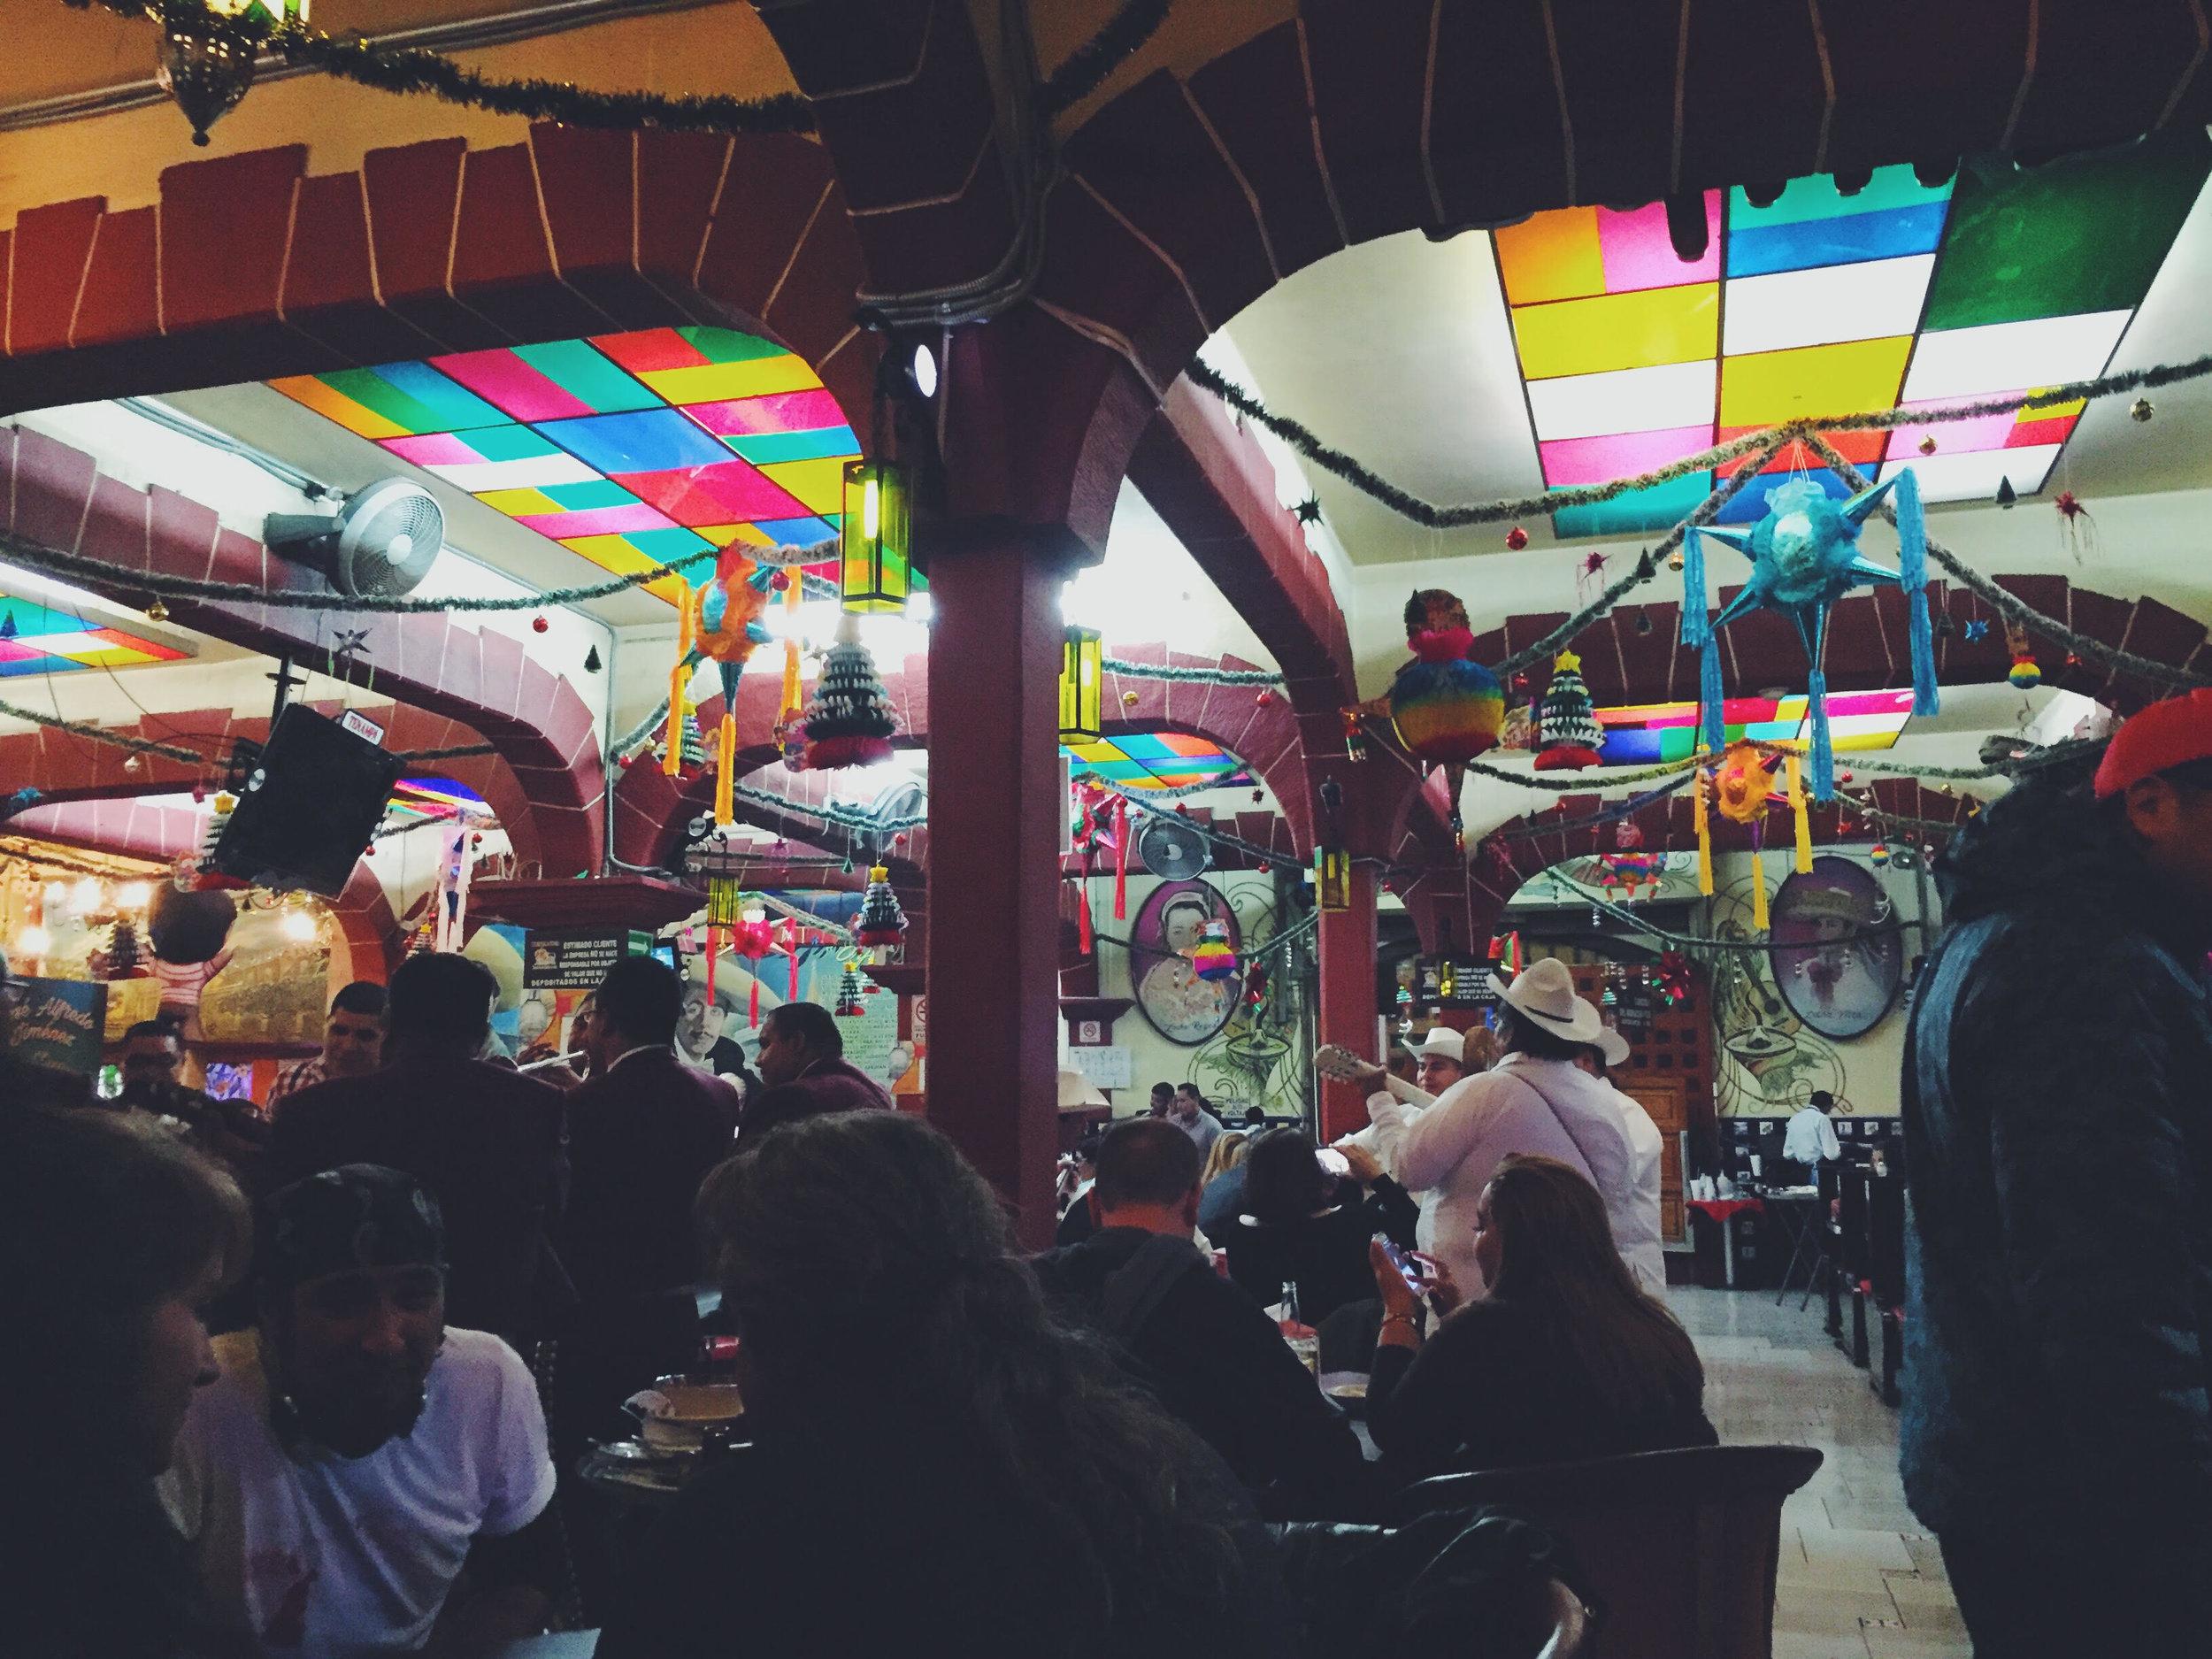 Salon Tenampa at Plaza Garibaldi